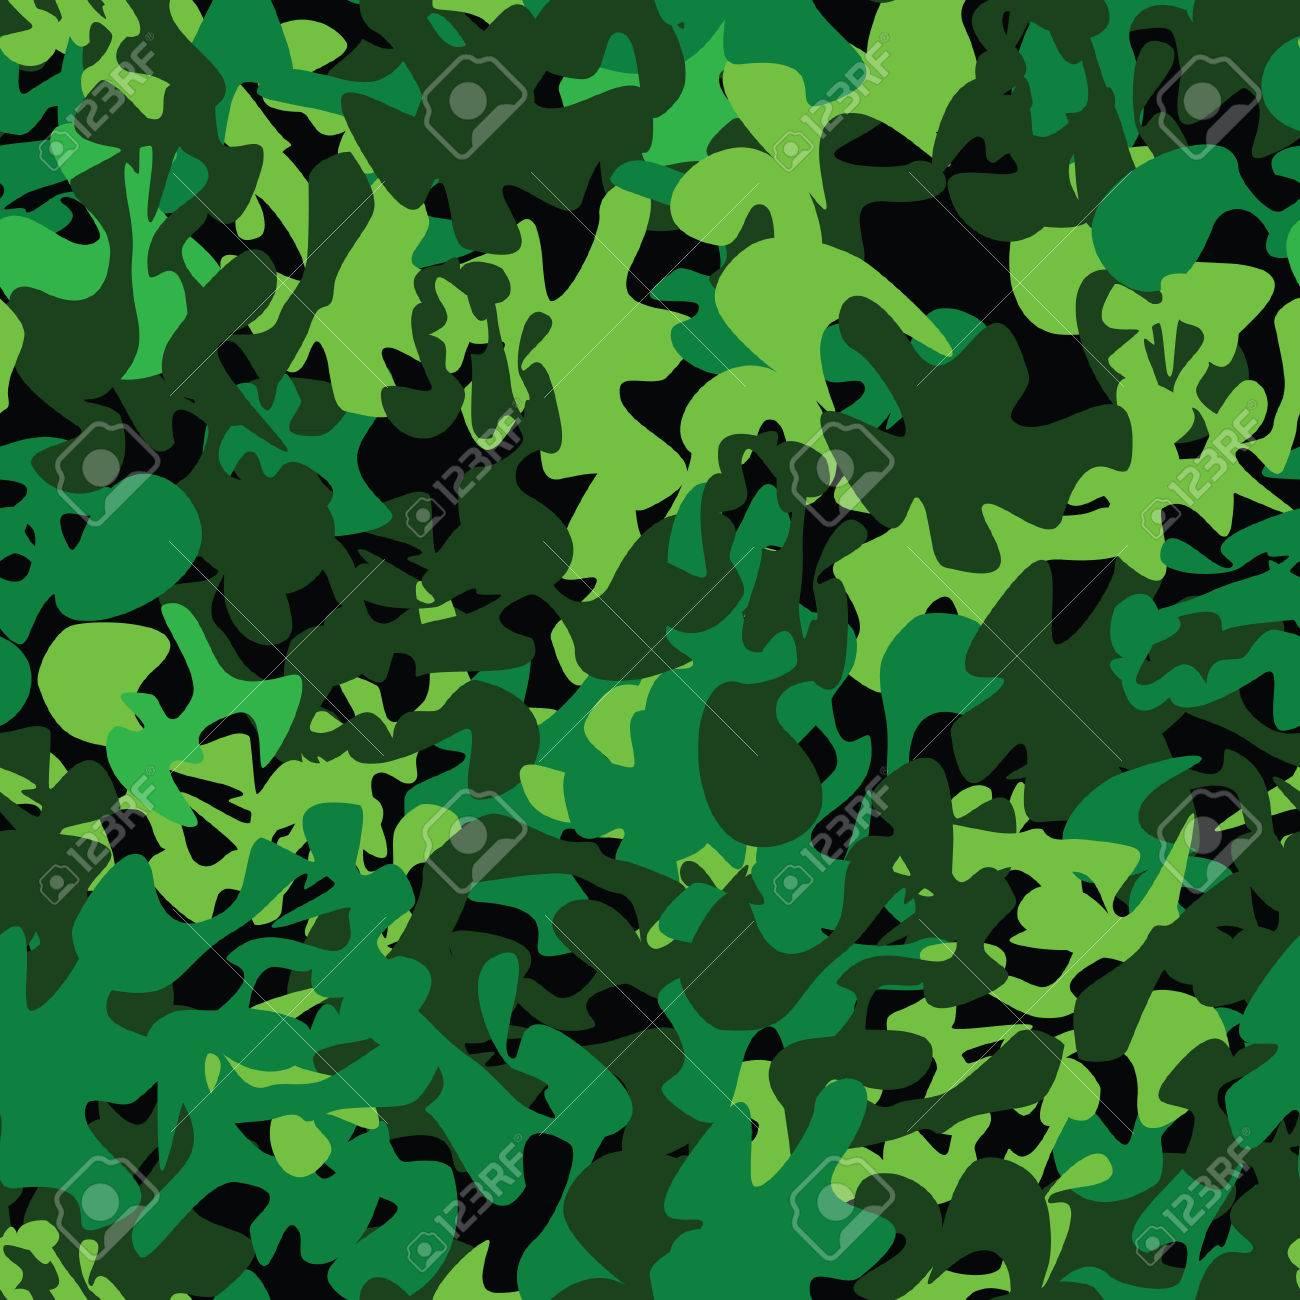 Militar Tarnen Nahtlose Muster Grau Abbildung